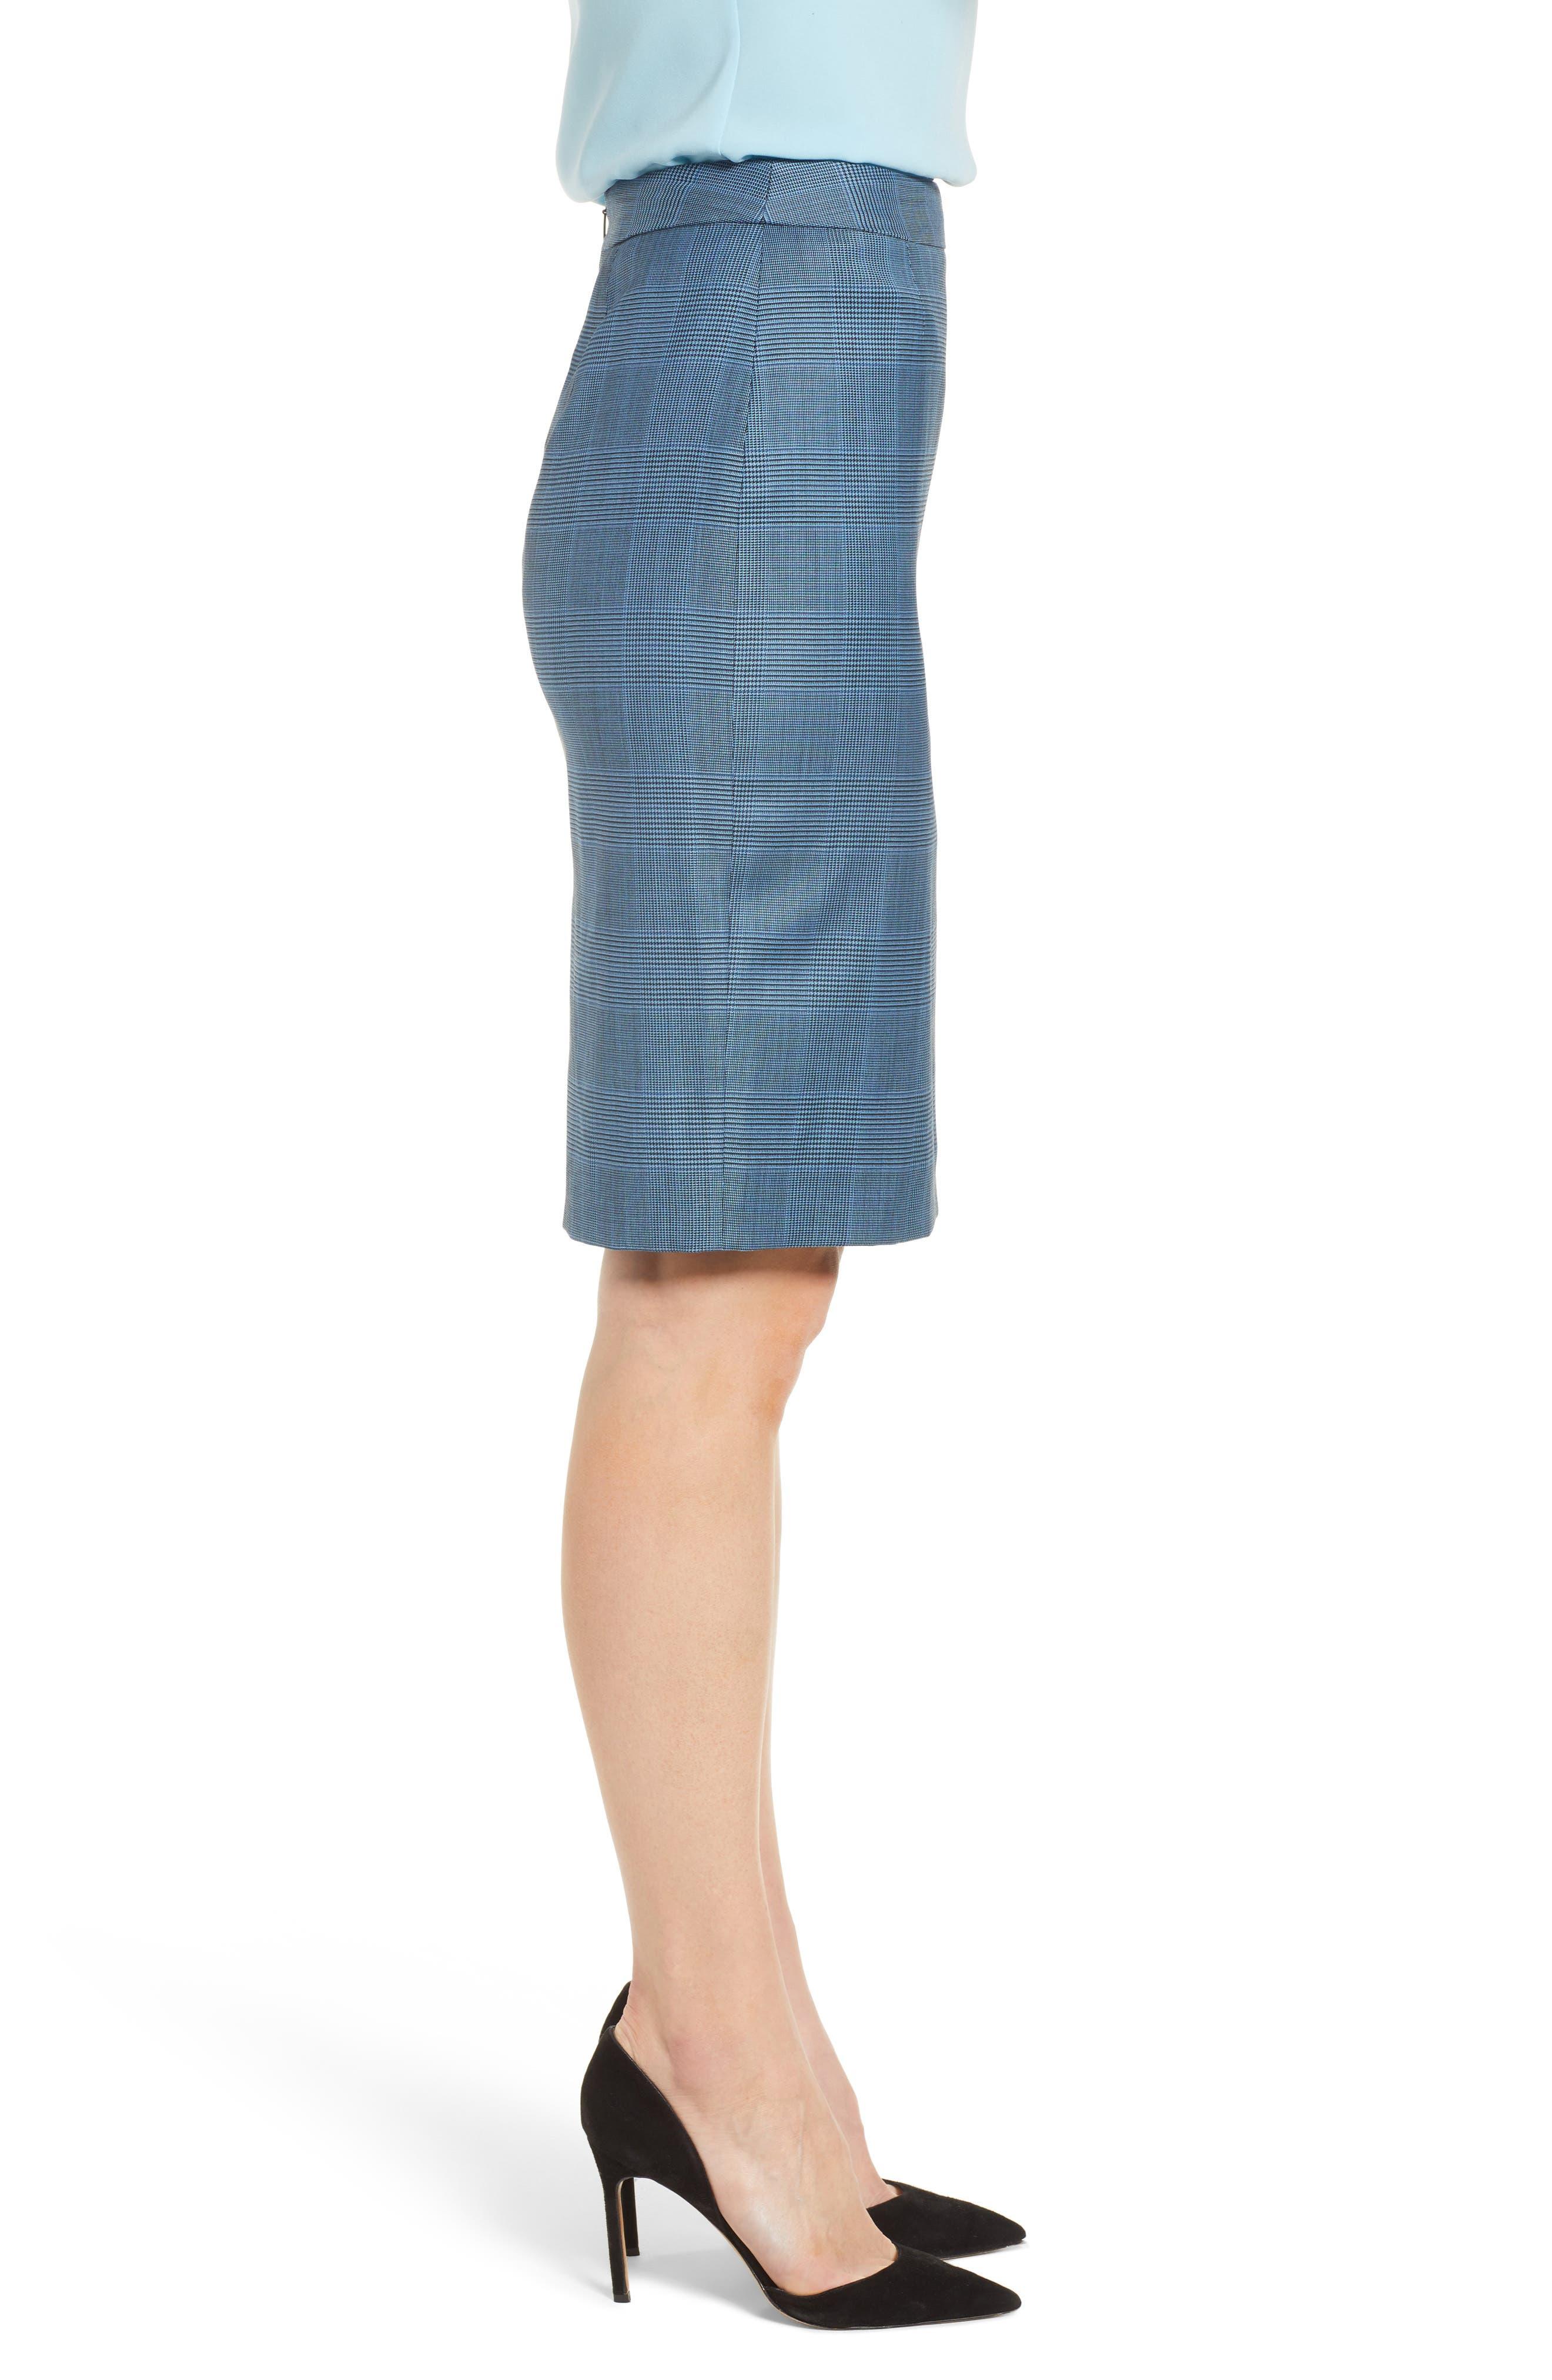 Vimena Glencheck Stretch Wool Pencil Skirt,                             Alternate thumbnail 3, color,                             Sailor Blue Fantasy